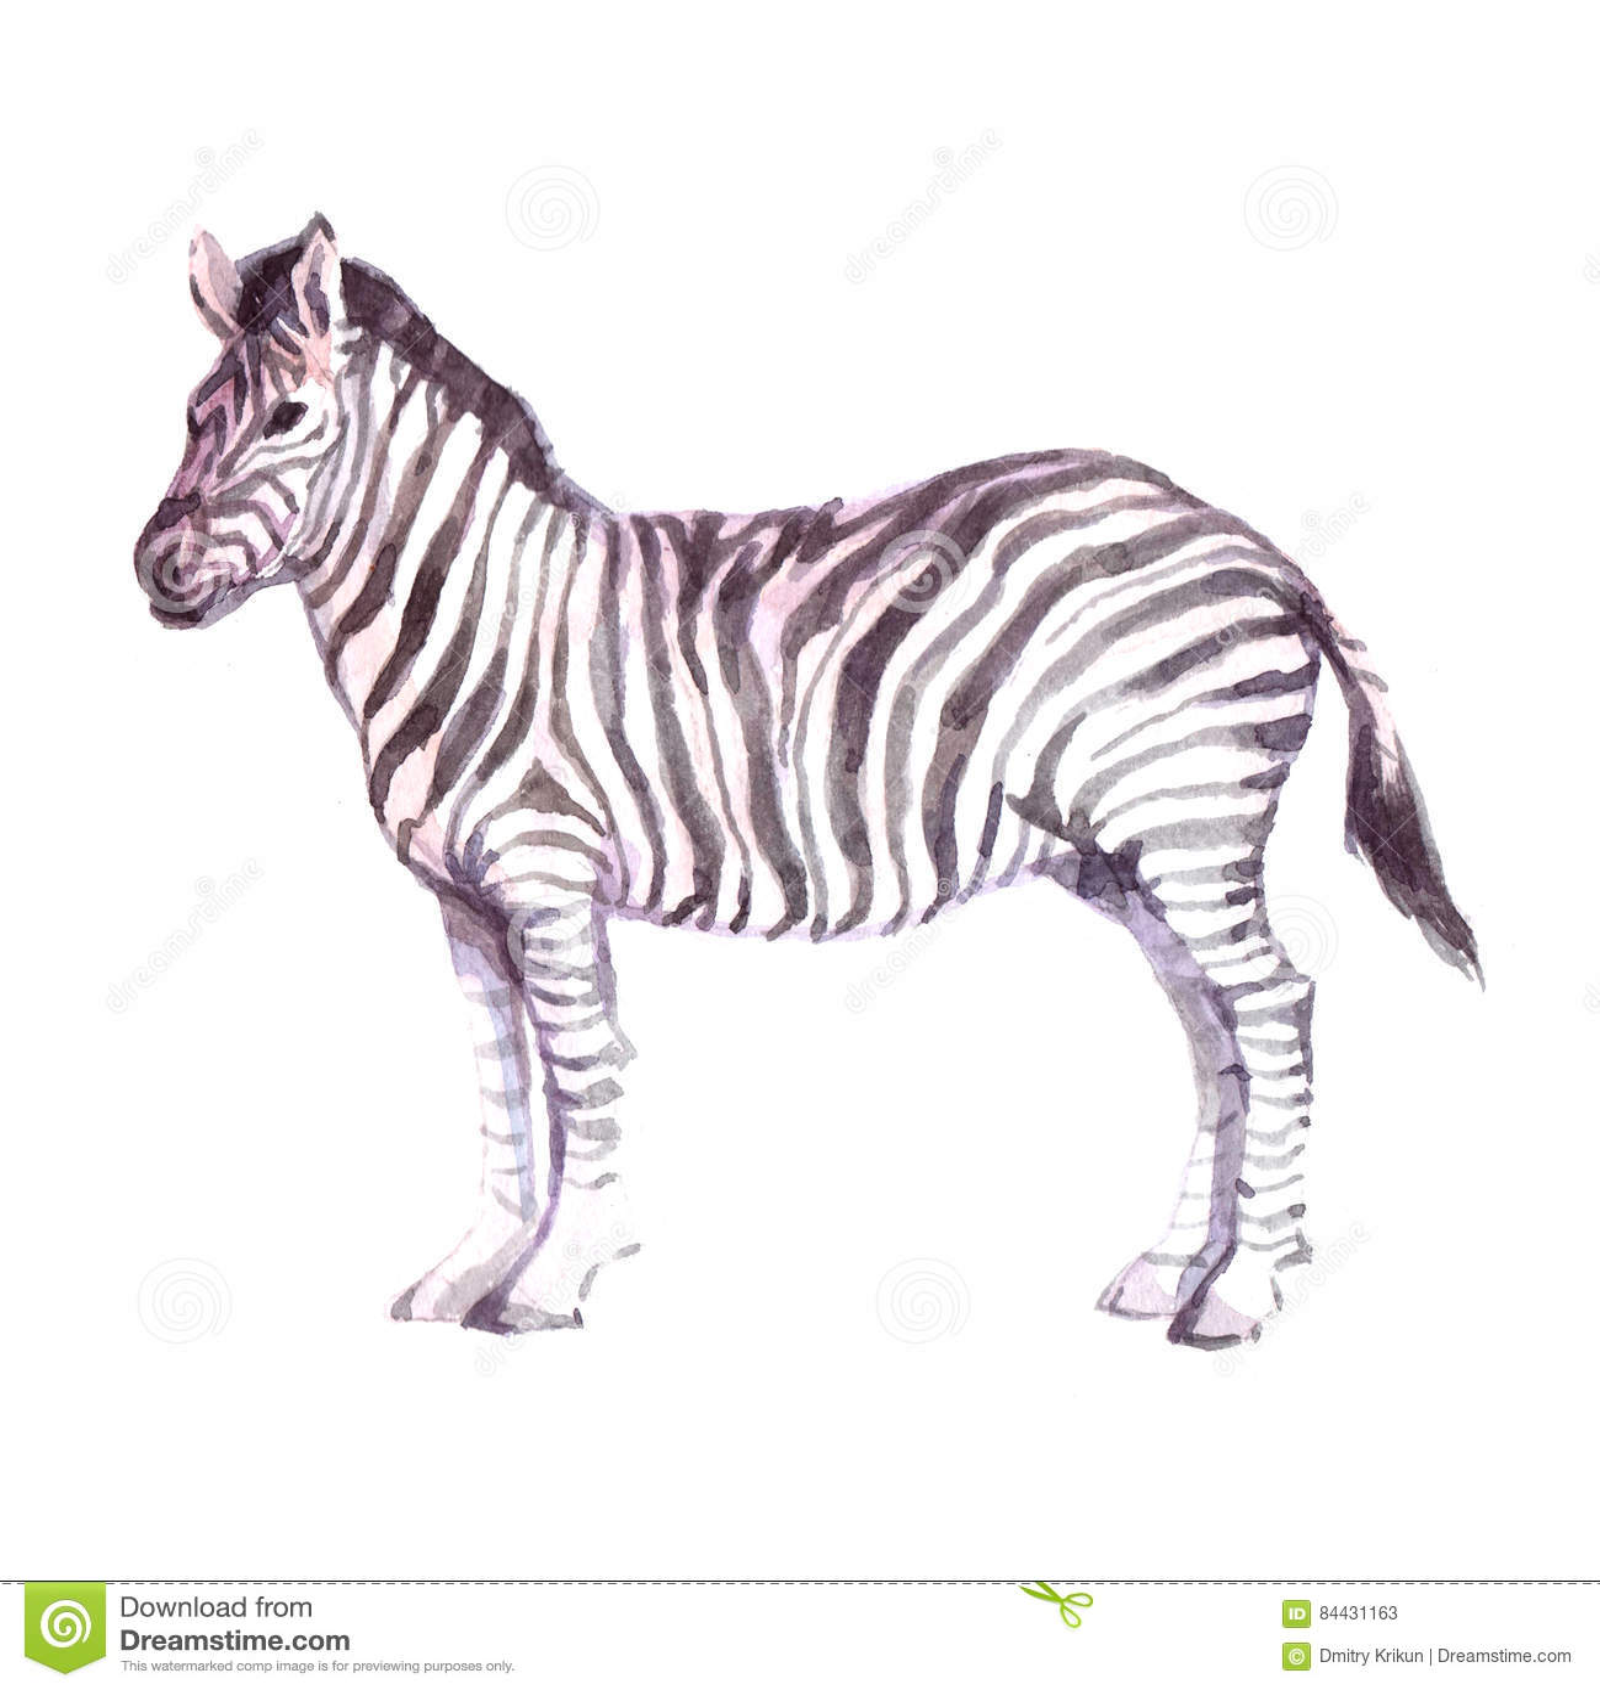 2d59acb1b Watercolor Realistic Zebra Animal Stock Illustration - Illustration ...